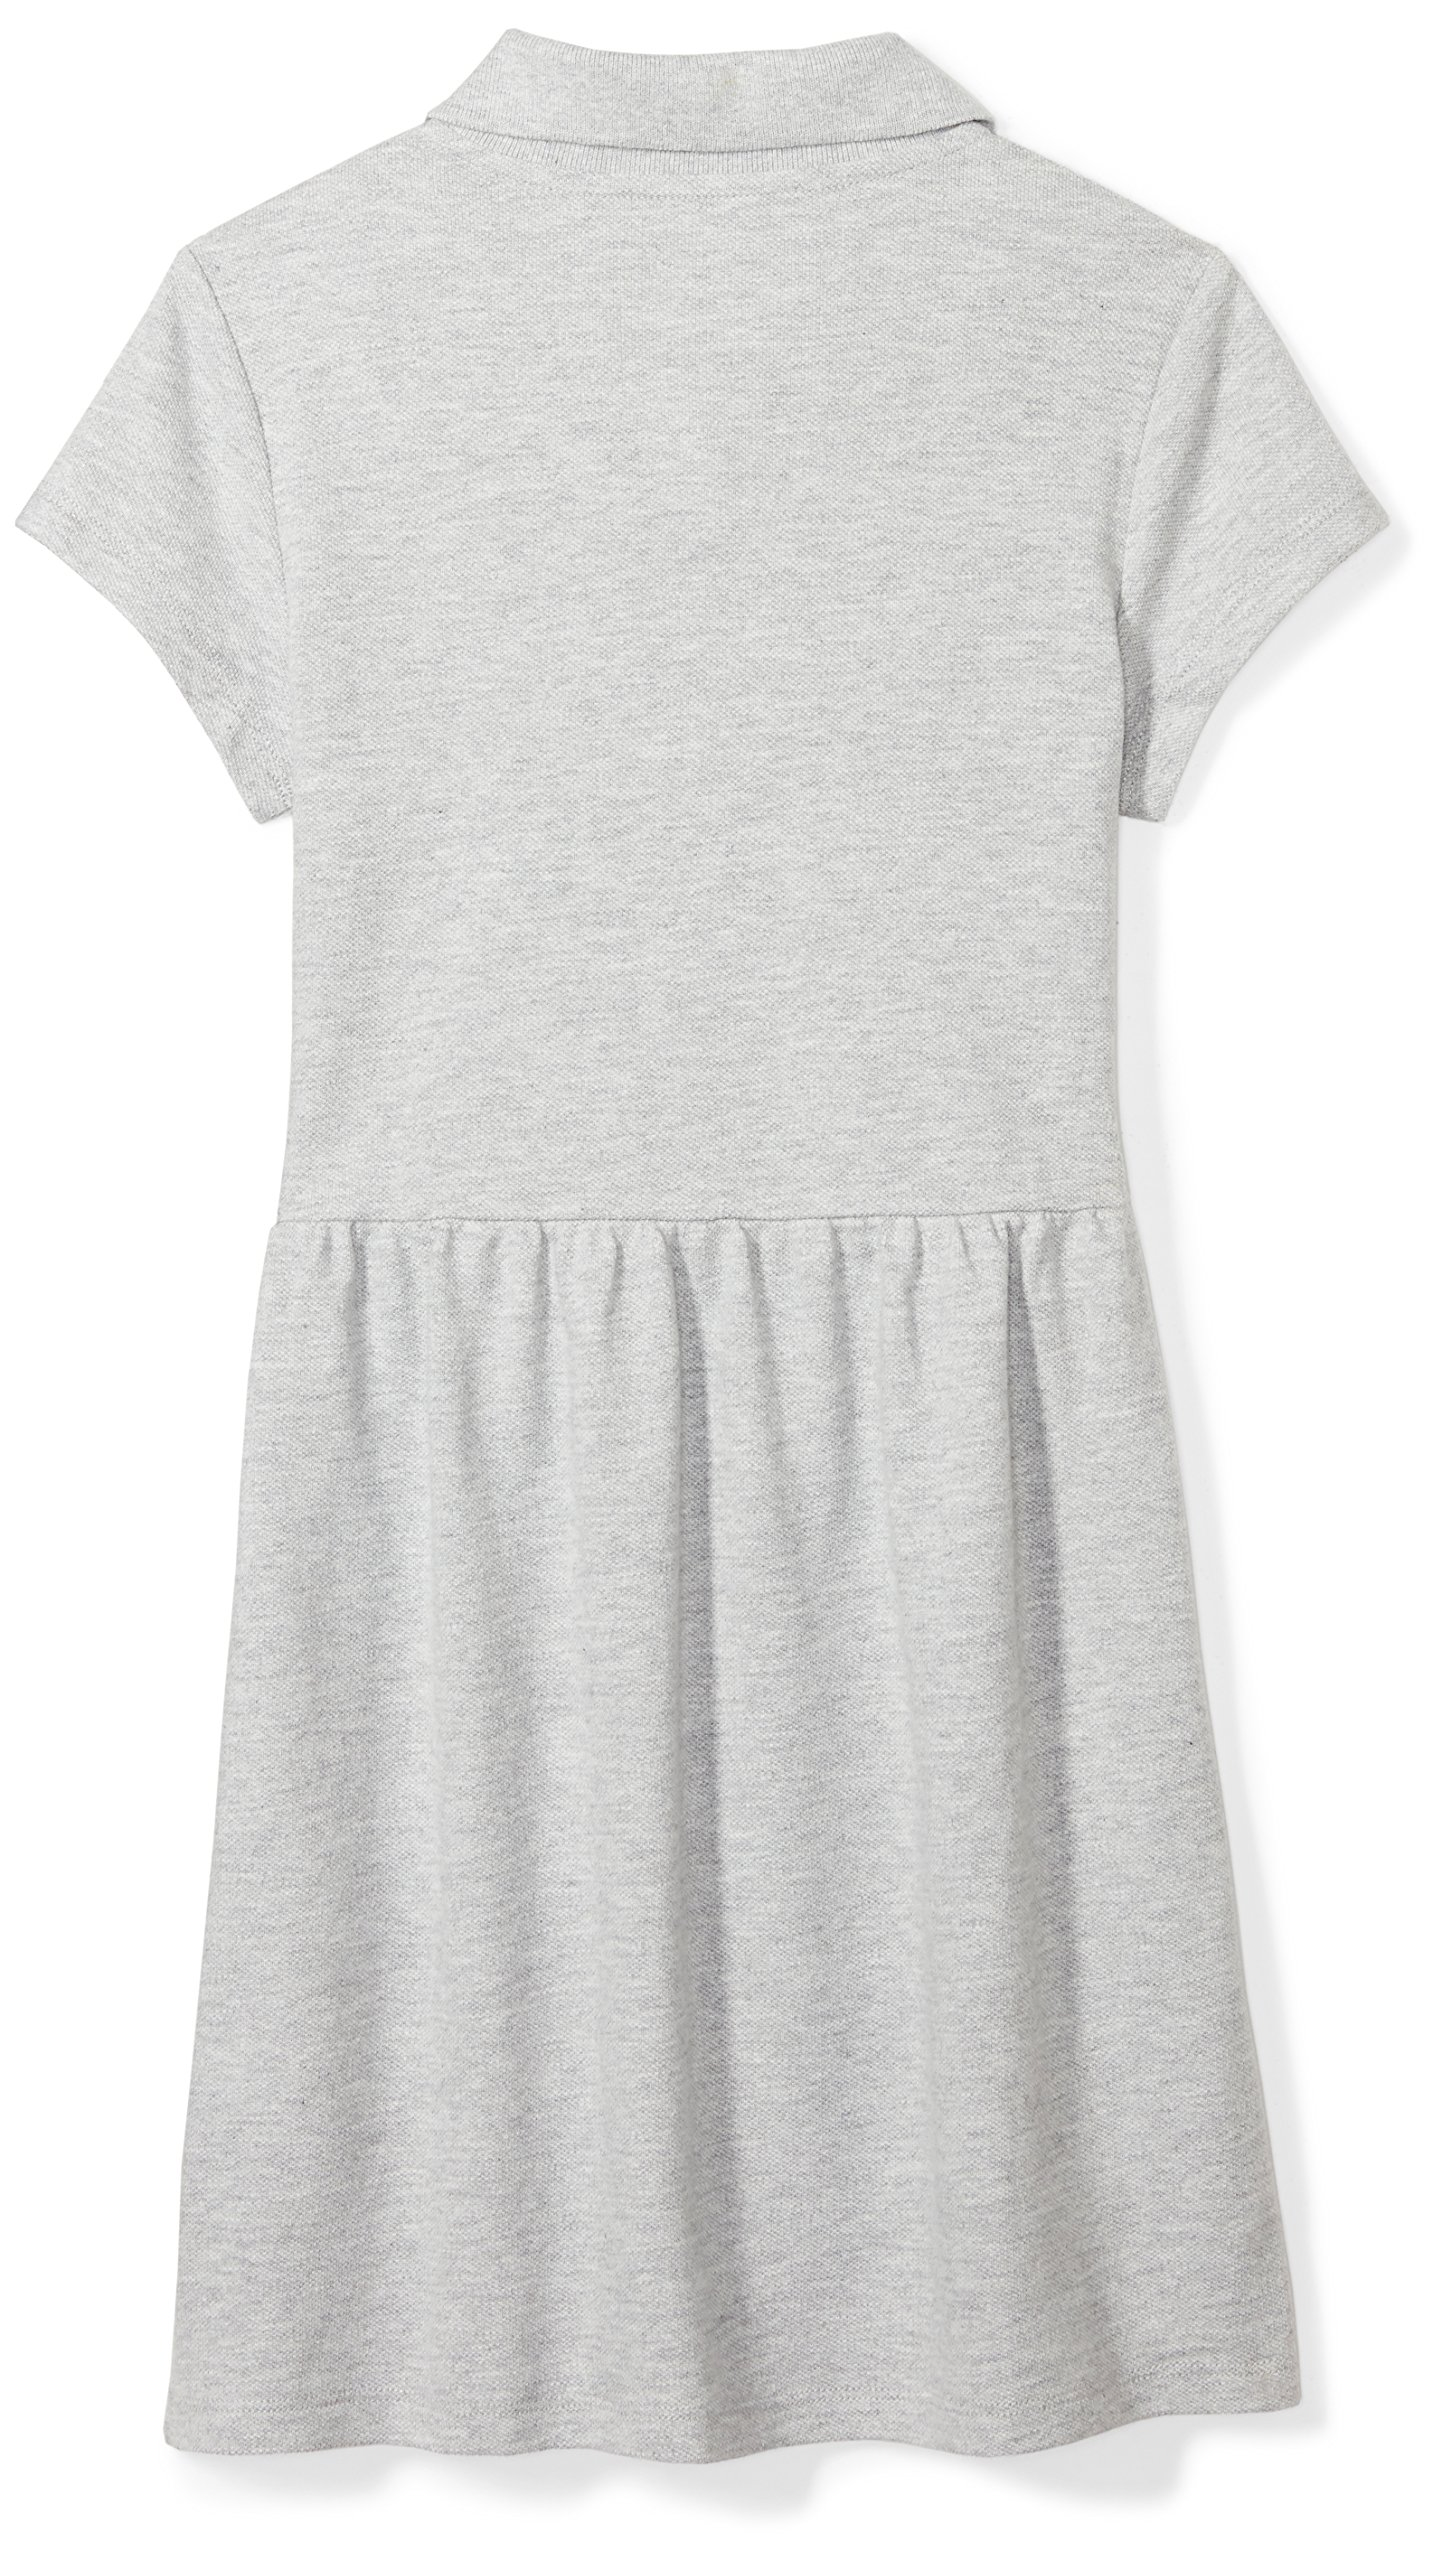 Amazon Essentials Girls' Short-Sleeve Polo Dress, Gray, M (8) by Amazon Essentials (Image #2)